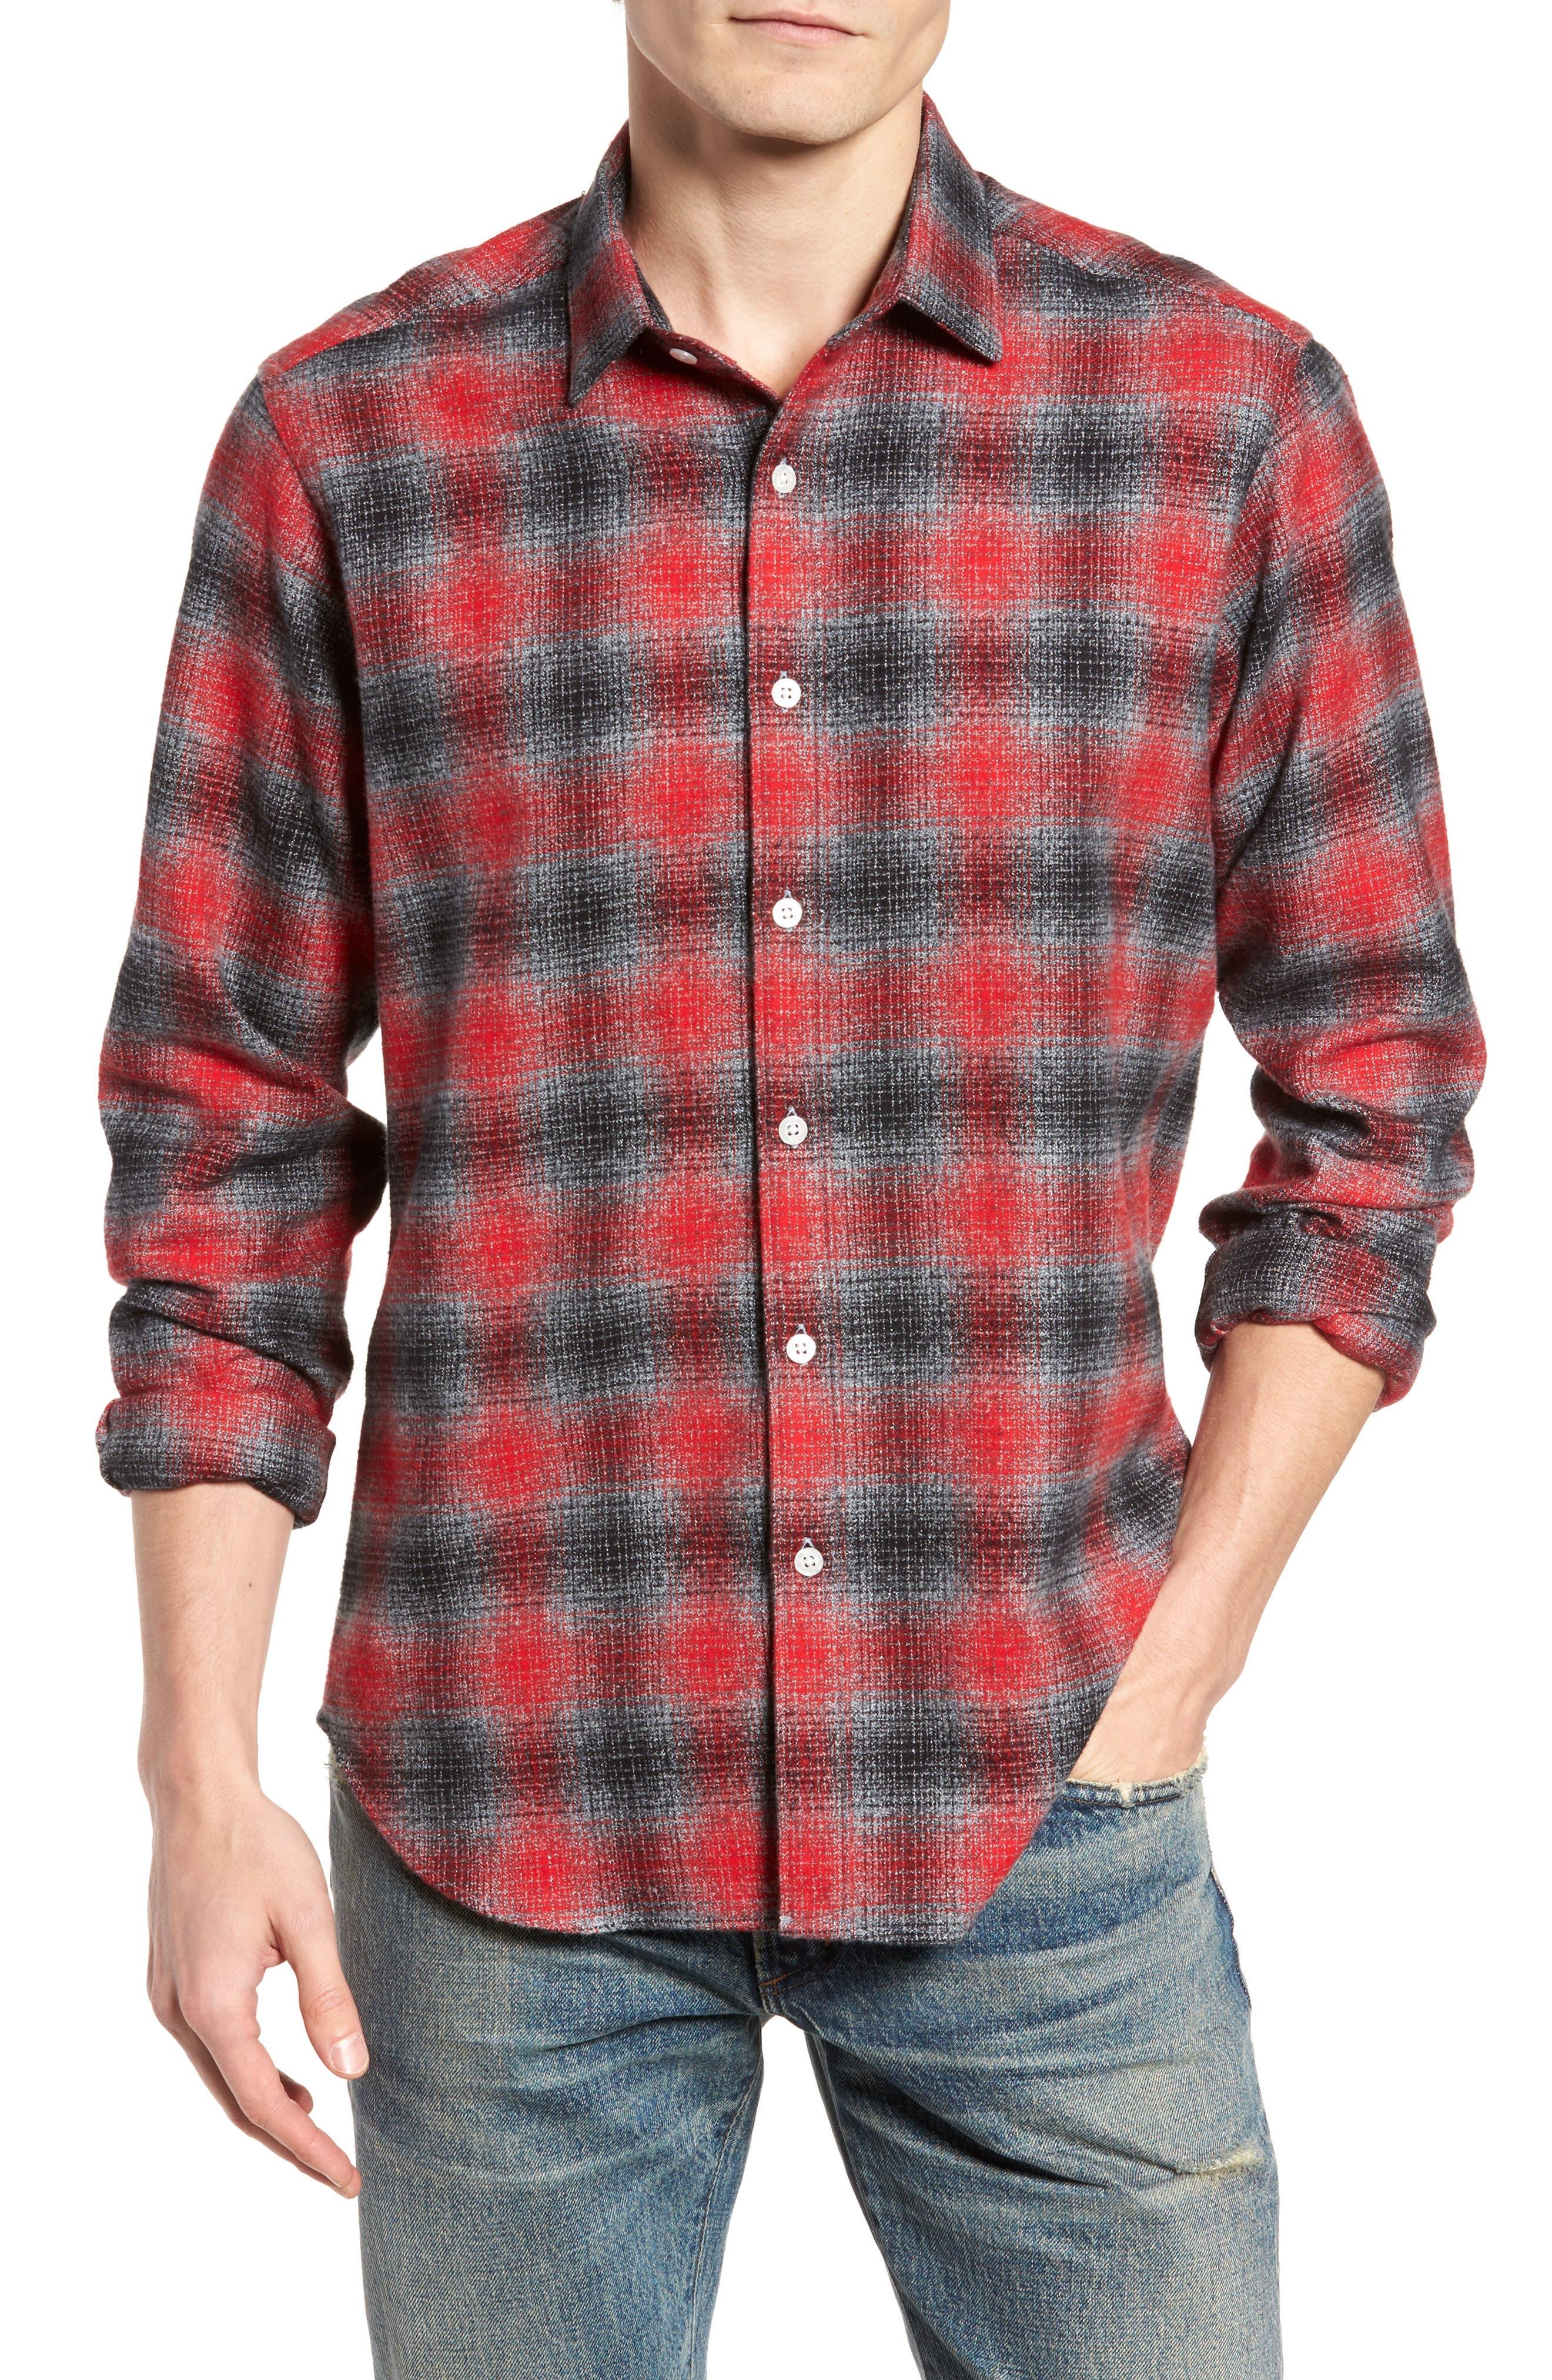 Main Image - Jeff Stowe Slim Fit Plaid Sport Shirt